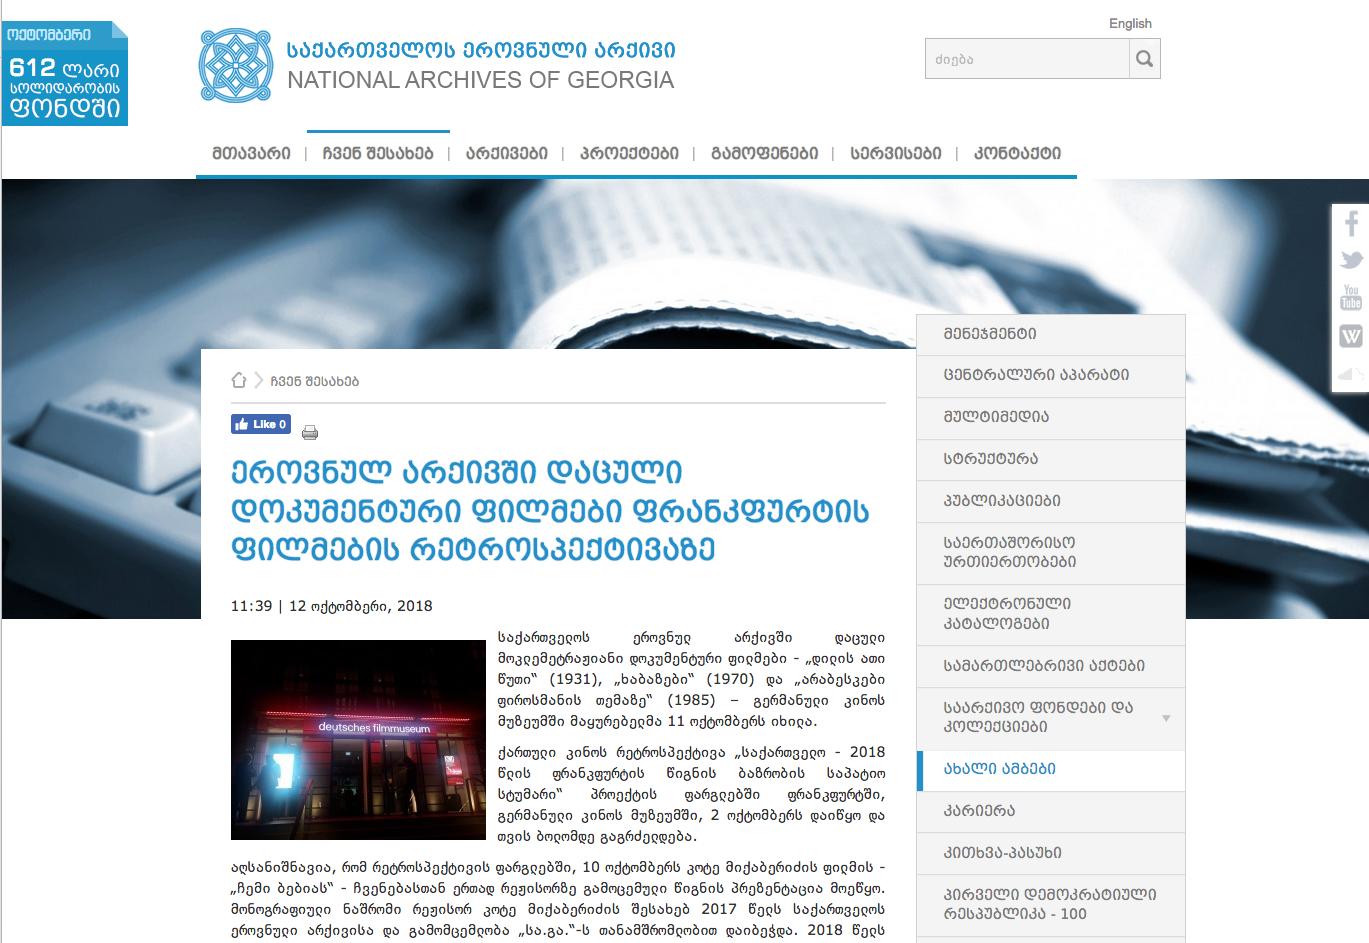 Image titlehttp://www.archives.gov.ge/ge/page/erovnul-arqivshi-daculi-dokumenturi-filmebi-frankfurtis-filmebis-retrospeqtivaze